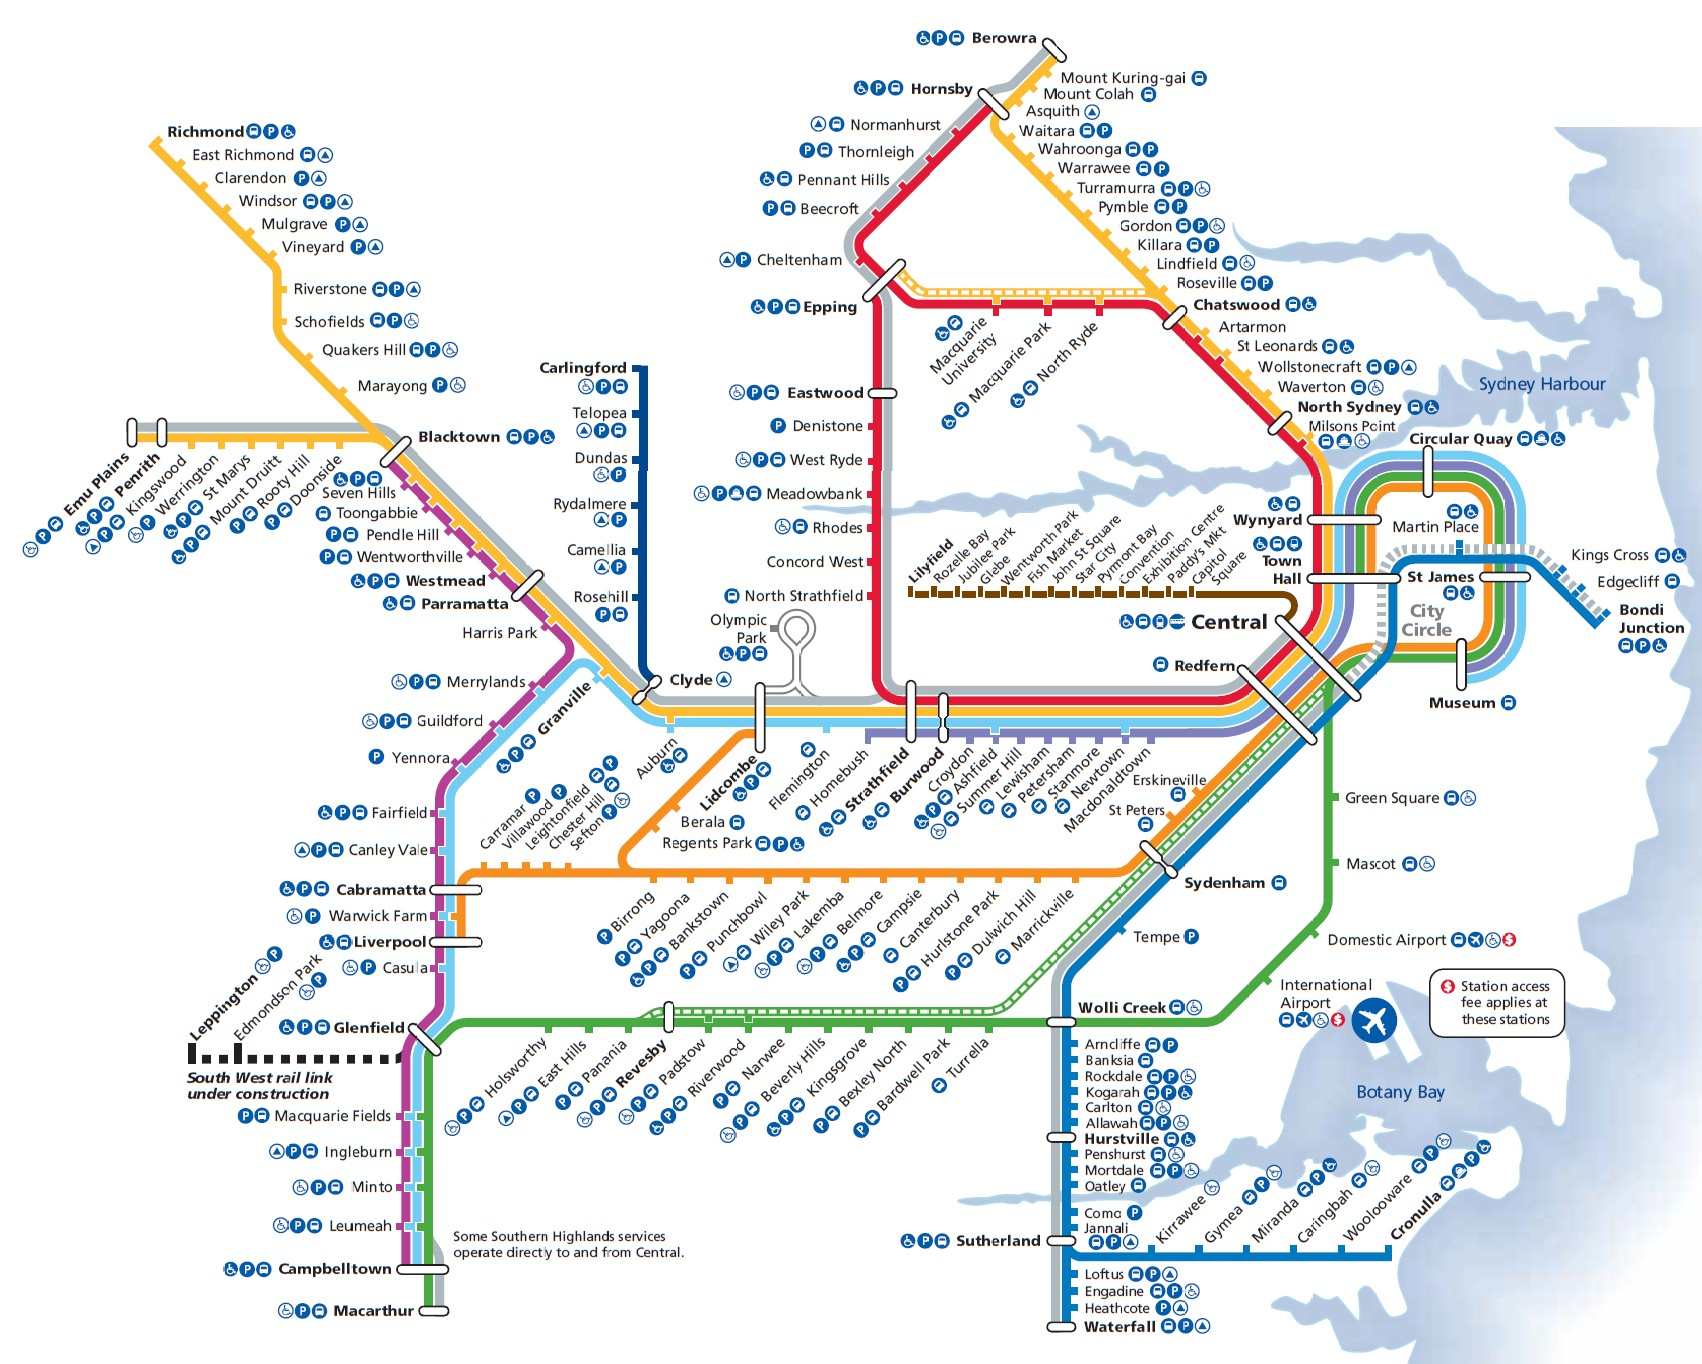 Map of Sydney's public transit system.